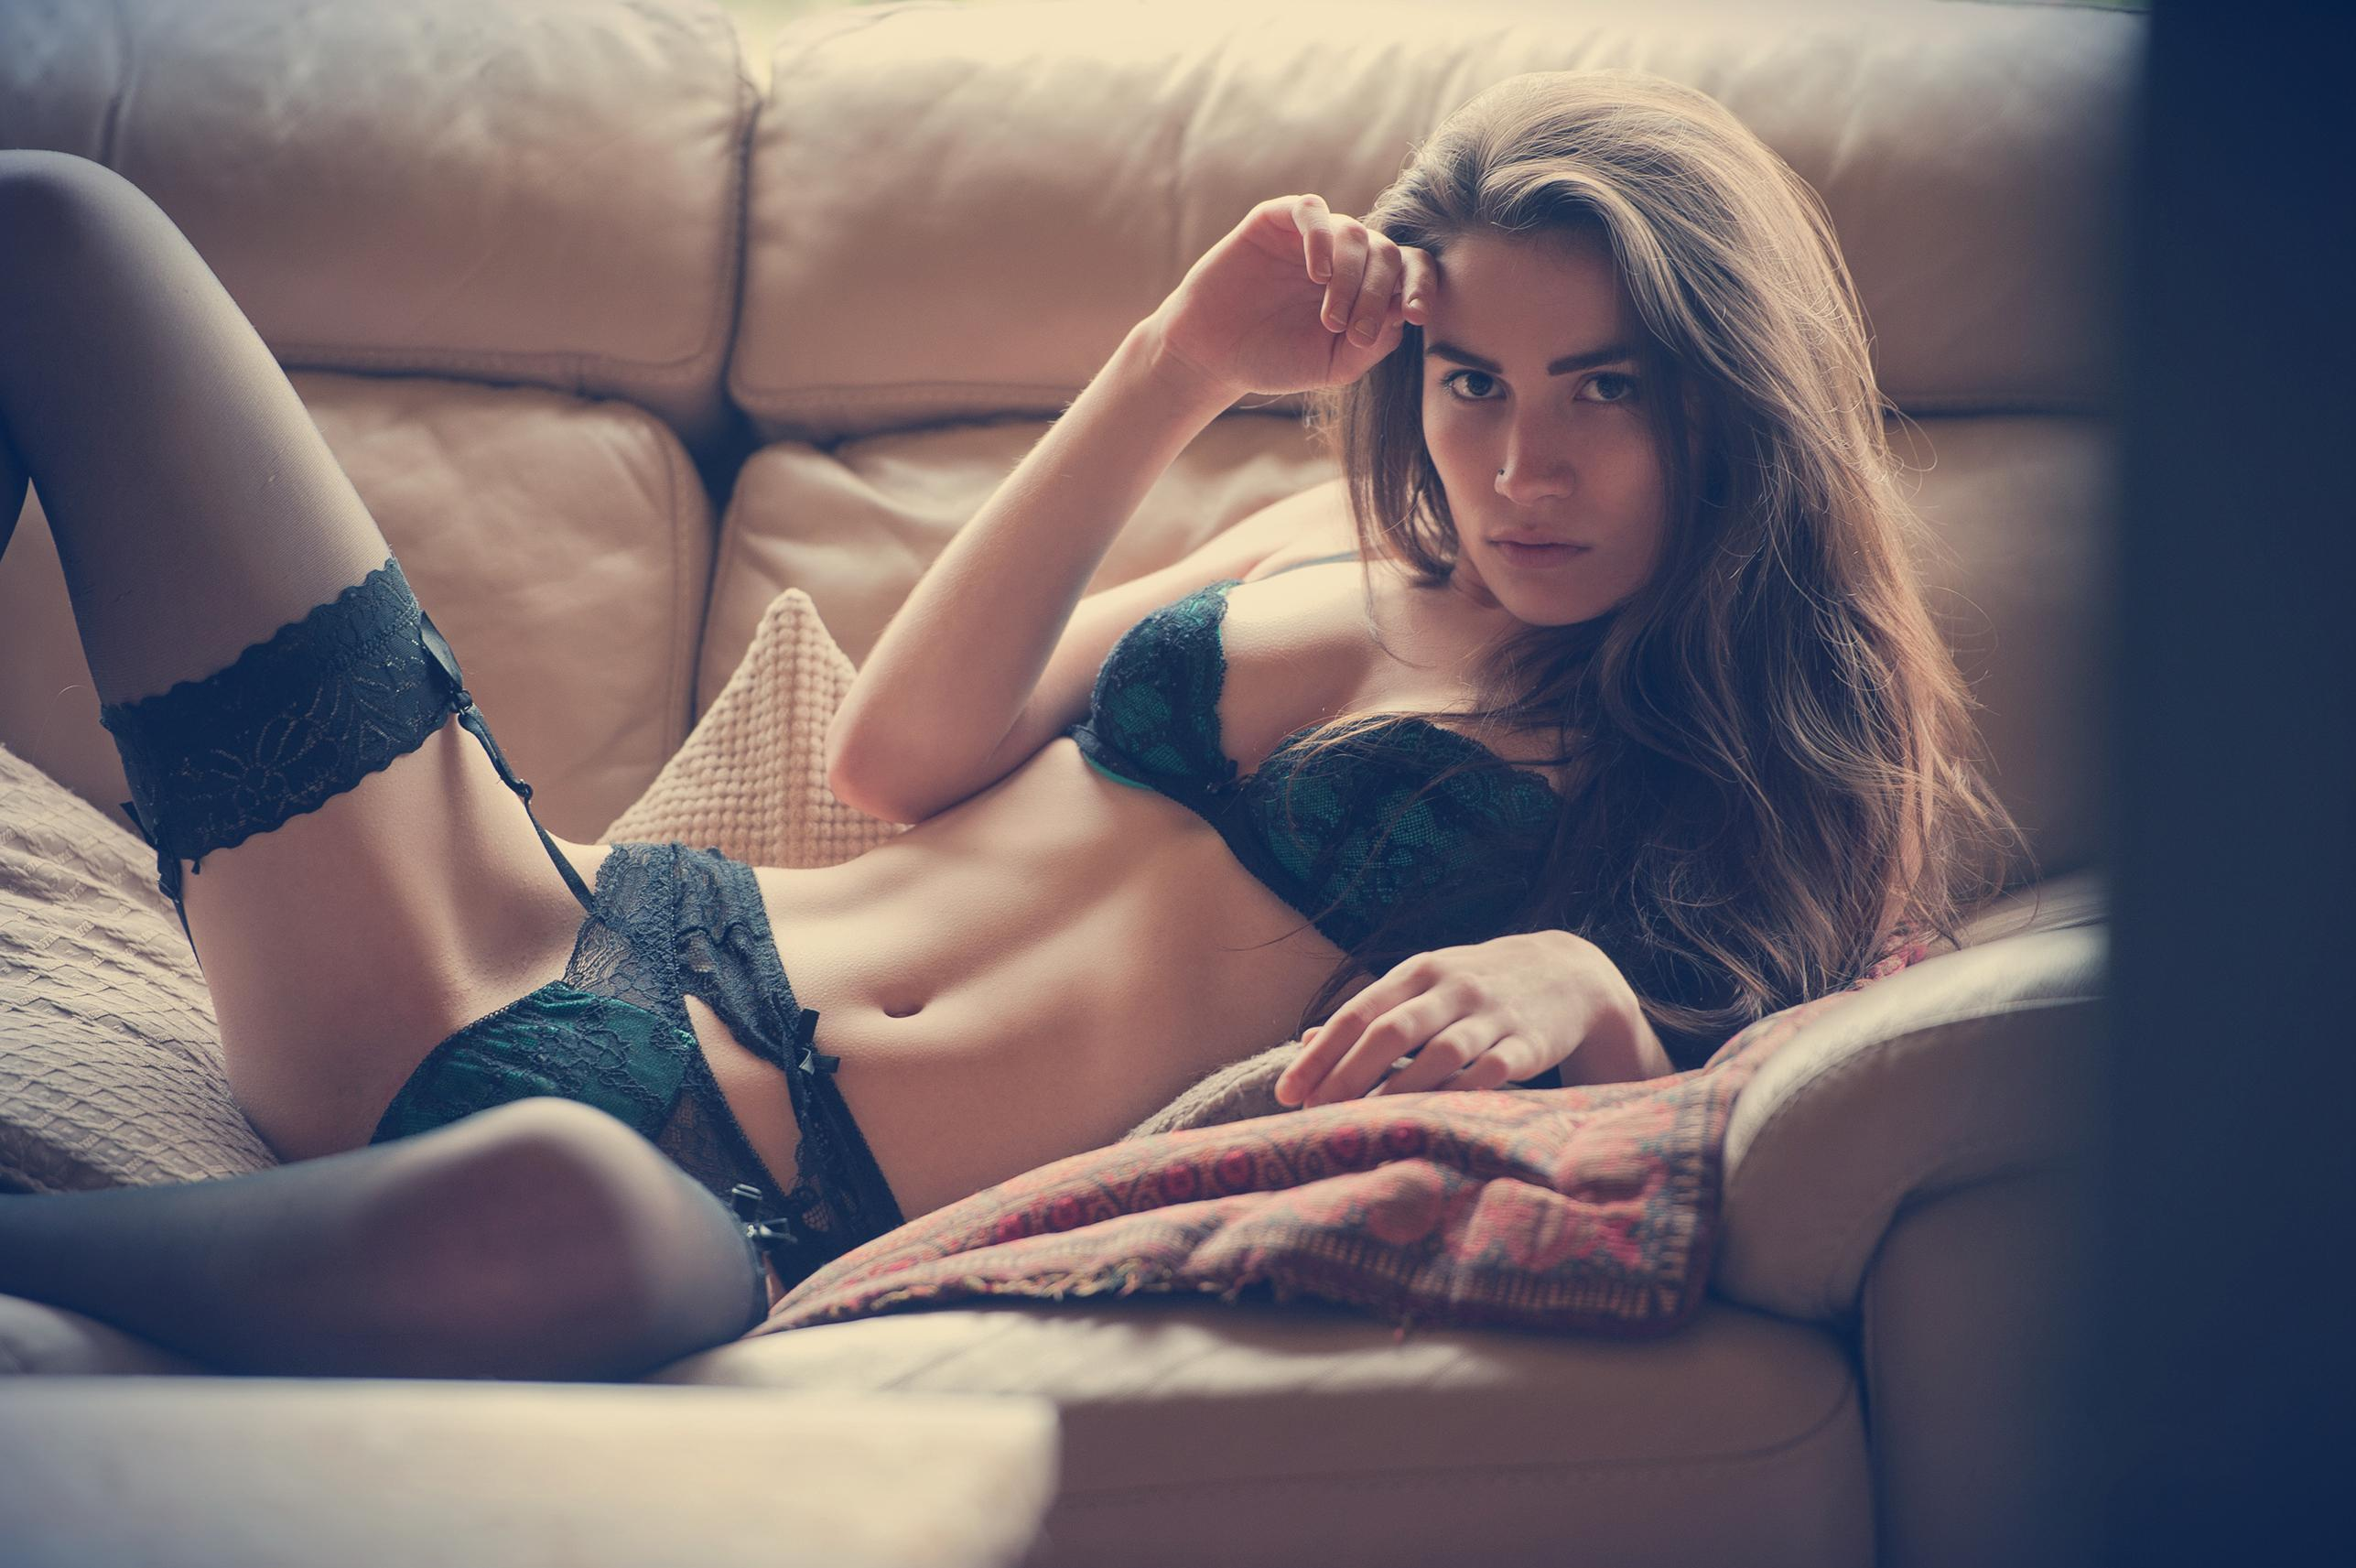 Fit Girl :: Женские мускулы :: Sveta Raketa :: красивая девушка ... | 1713x2574